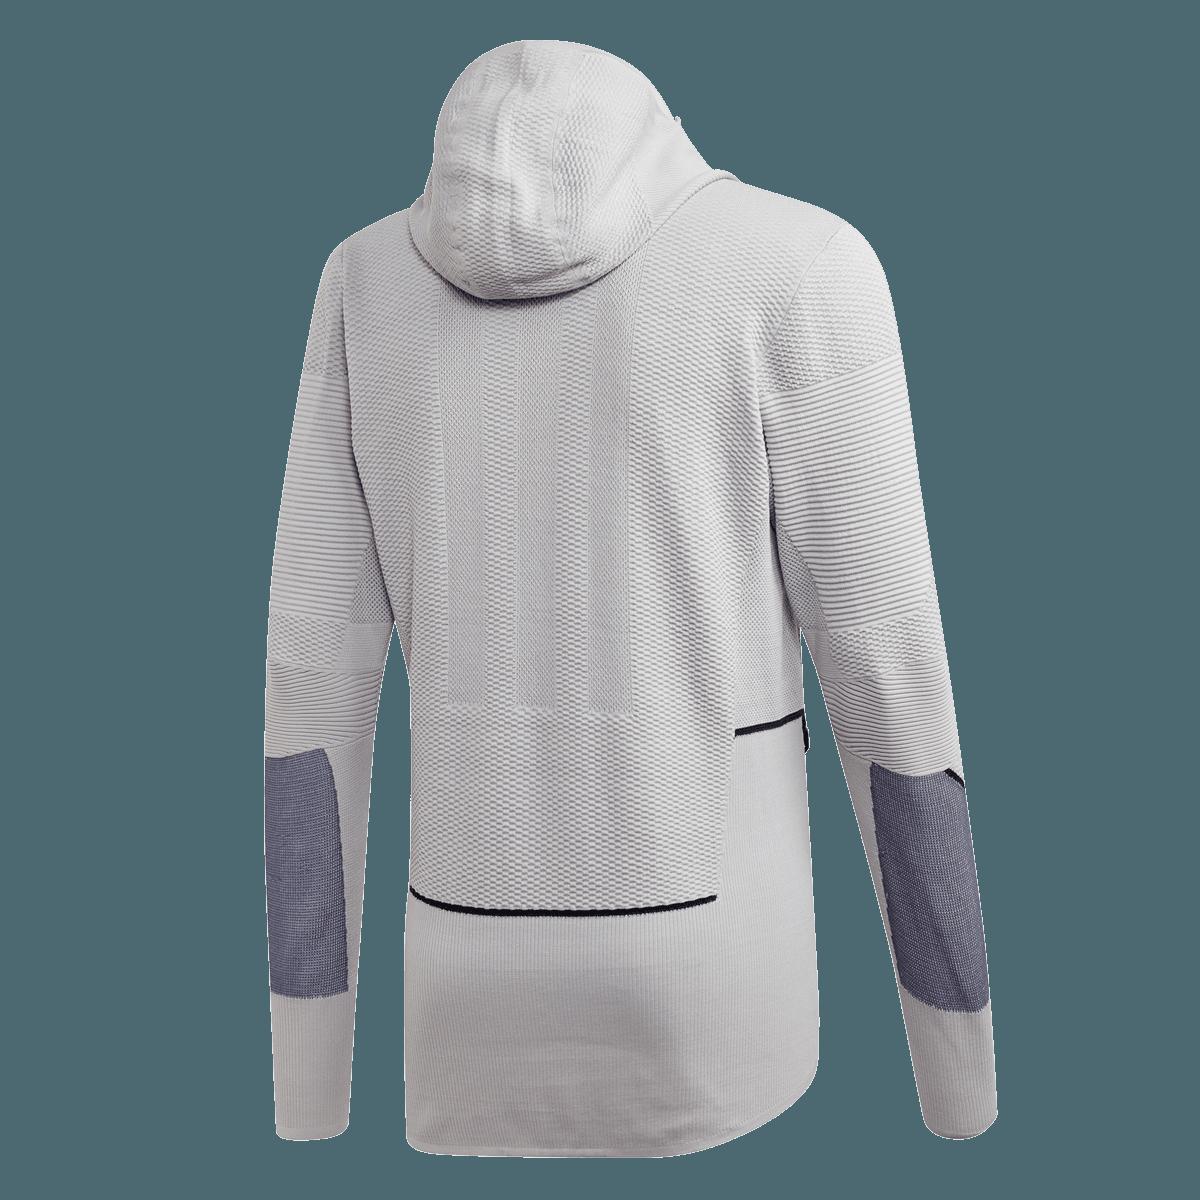 adidas Kapuzenjacke Primeknit Midlayer Jacket hellgrauschwarz